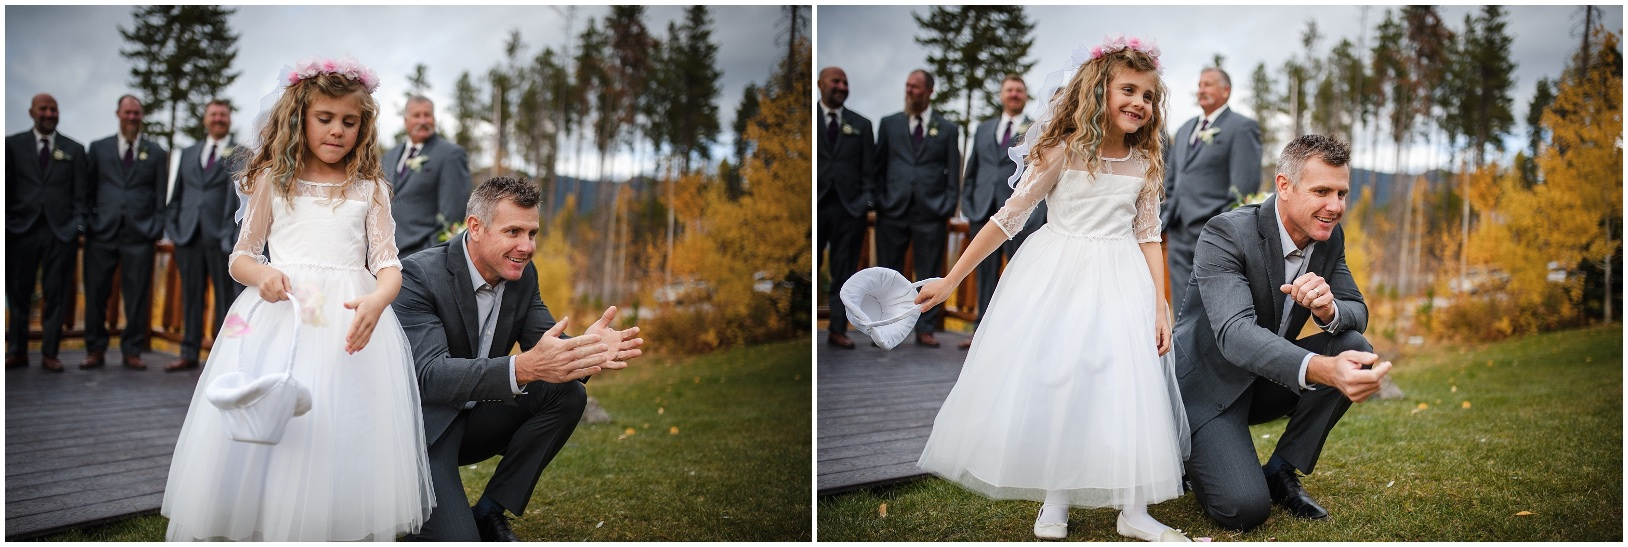 lindseyjane_wedding048.jpg